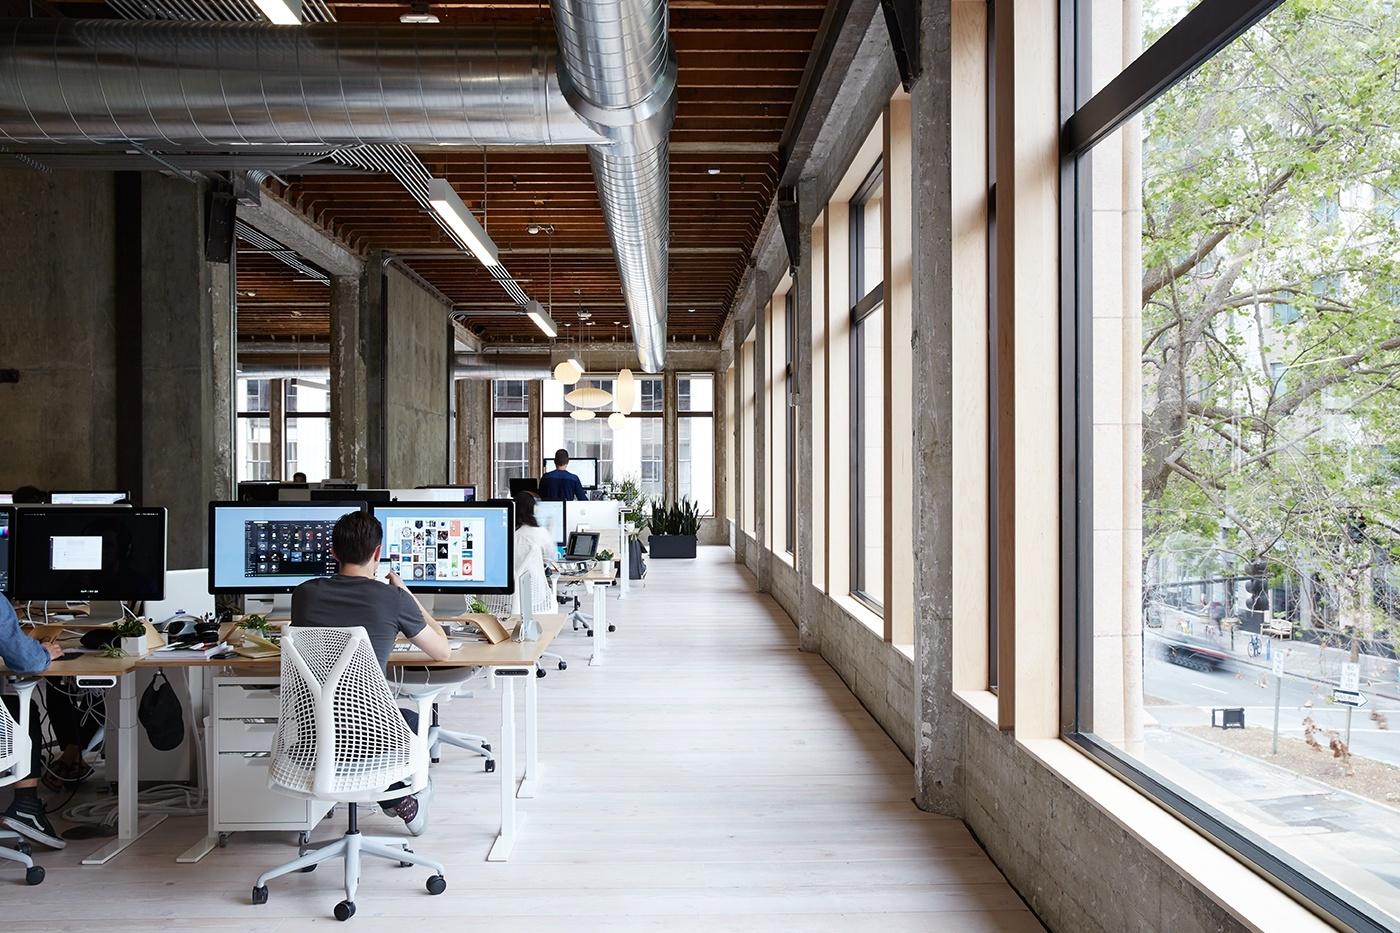 Used Work Vans >> A Look Inside VSCO's Amazing Headquarters in Oakland